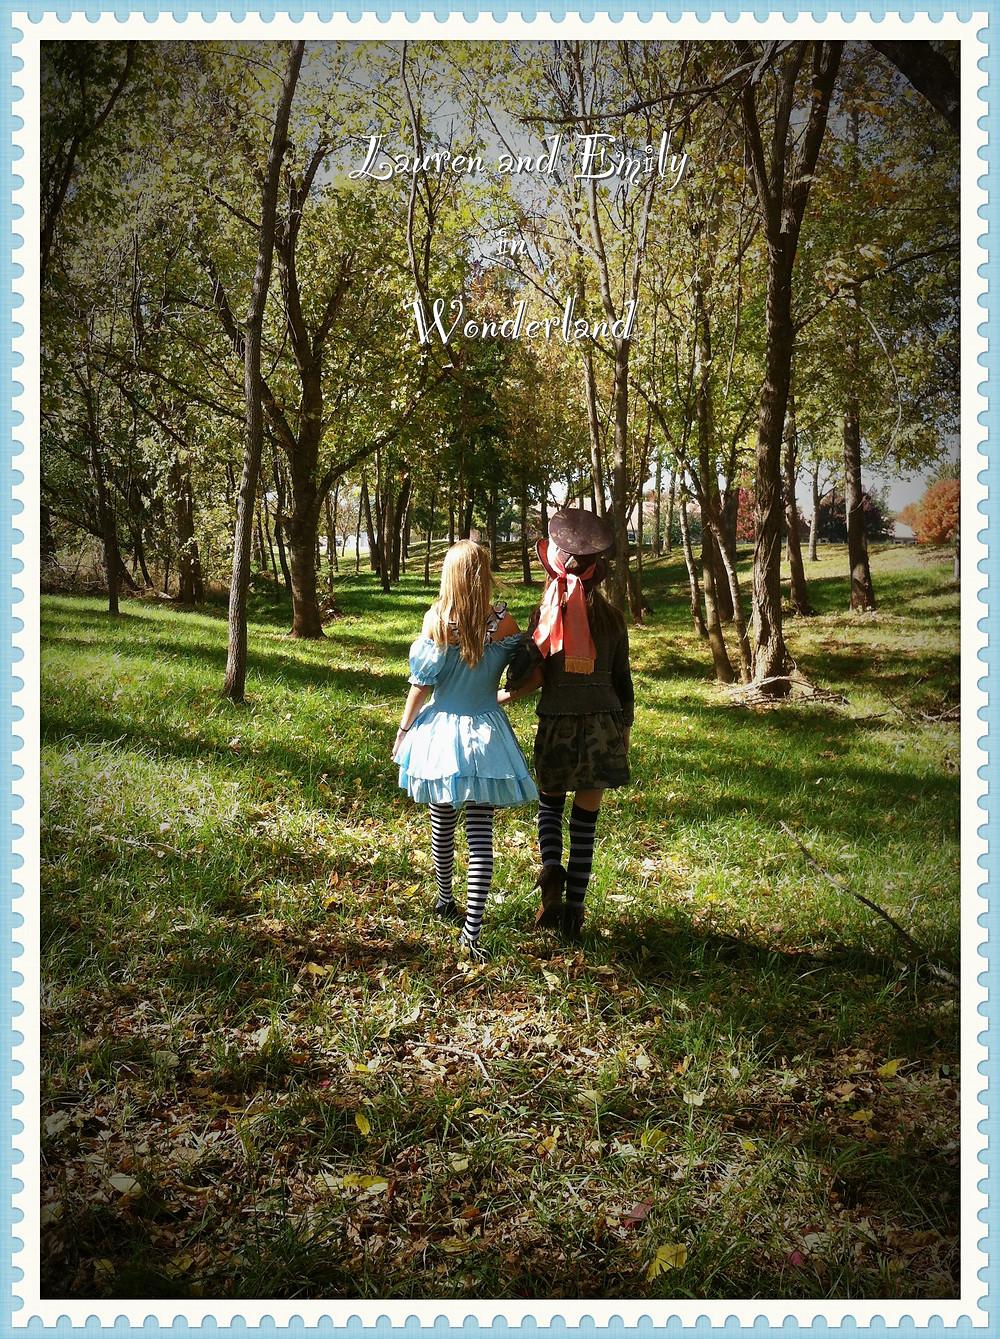 Lauren and Emily in wonderland.jpg